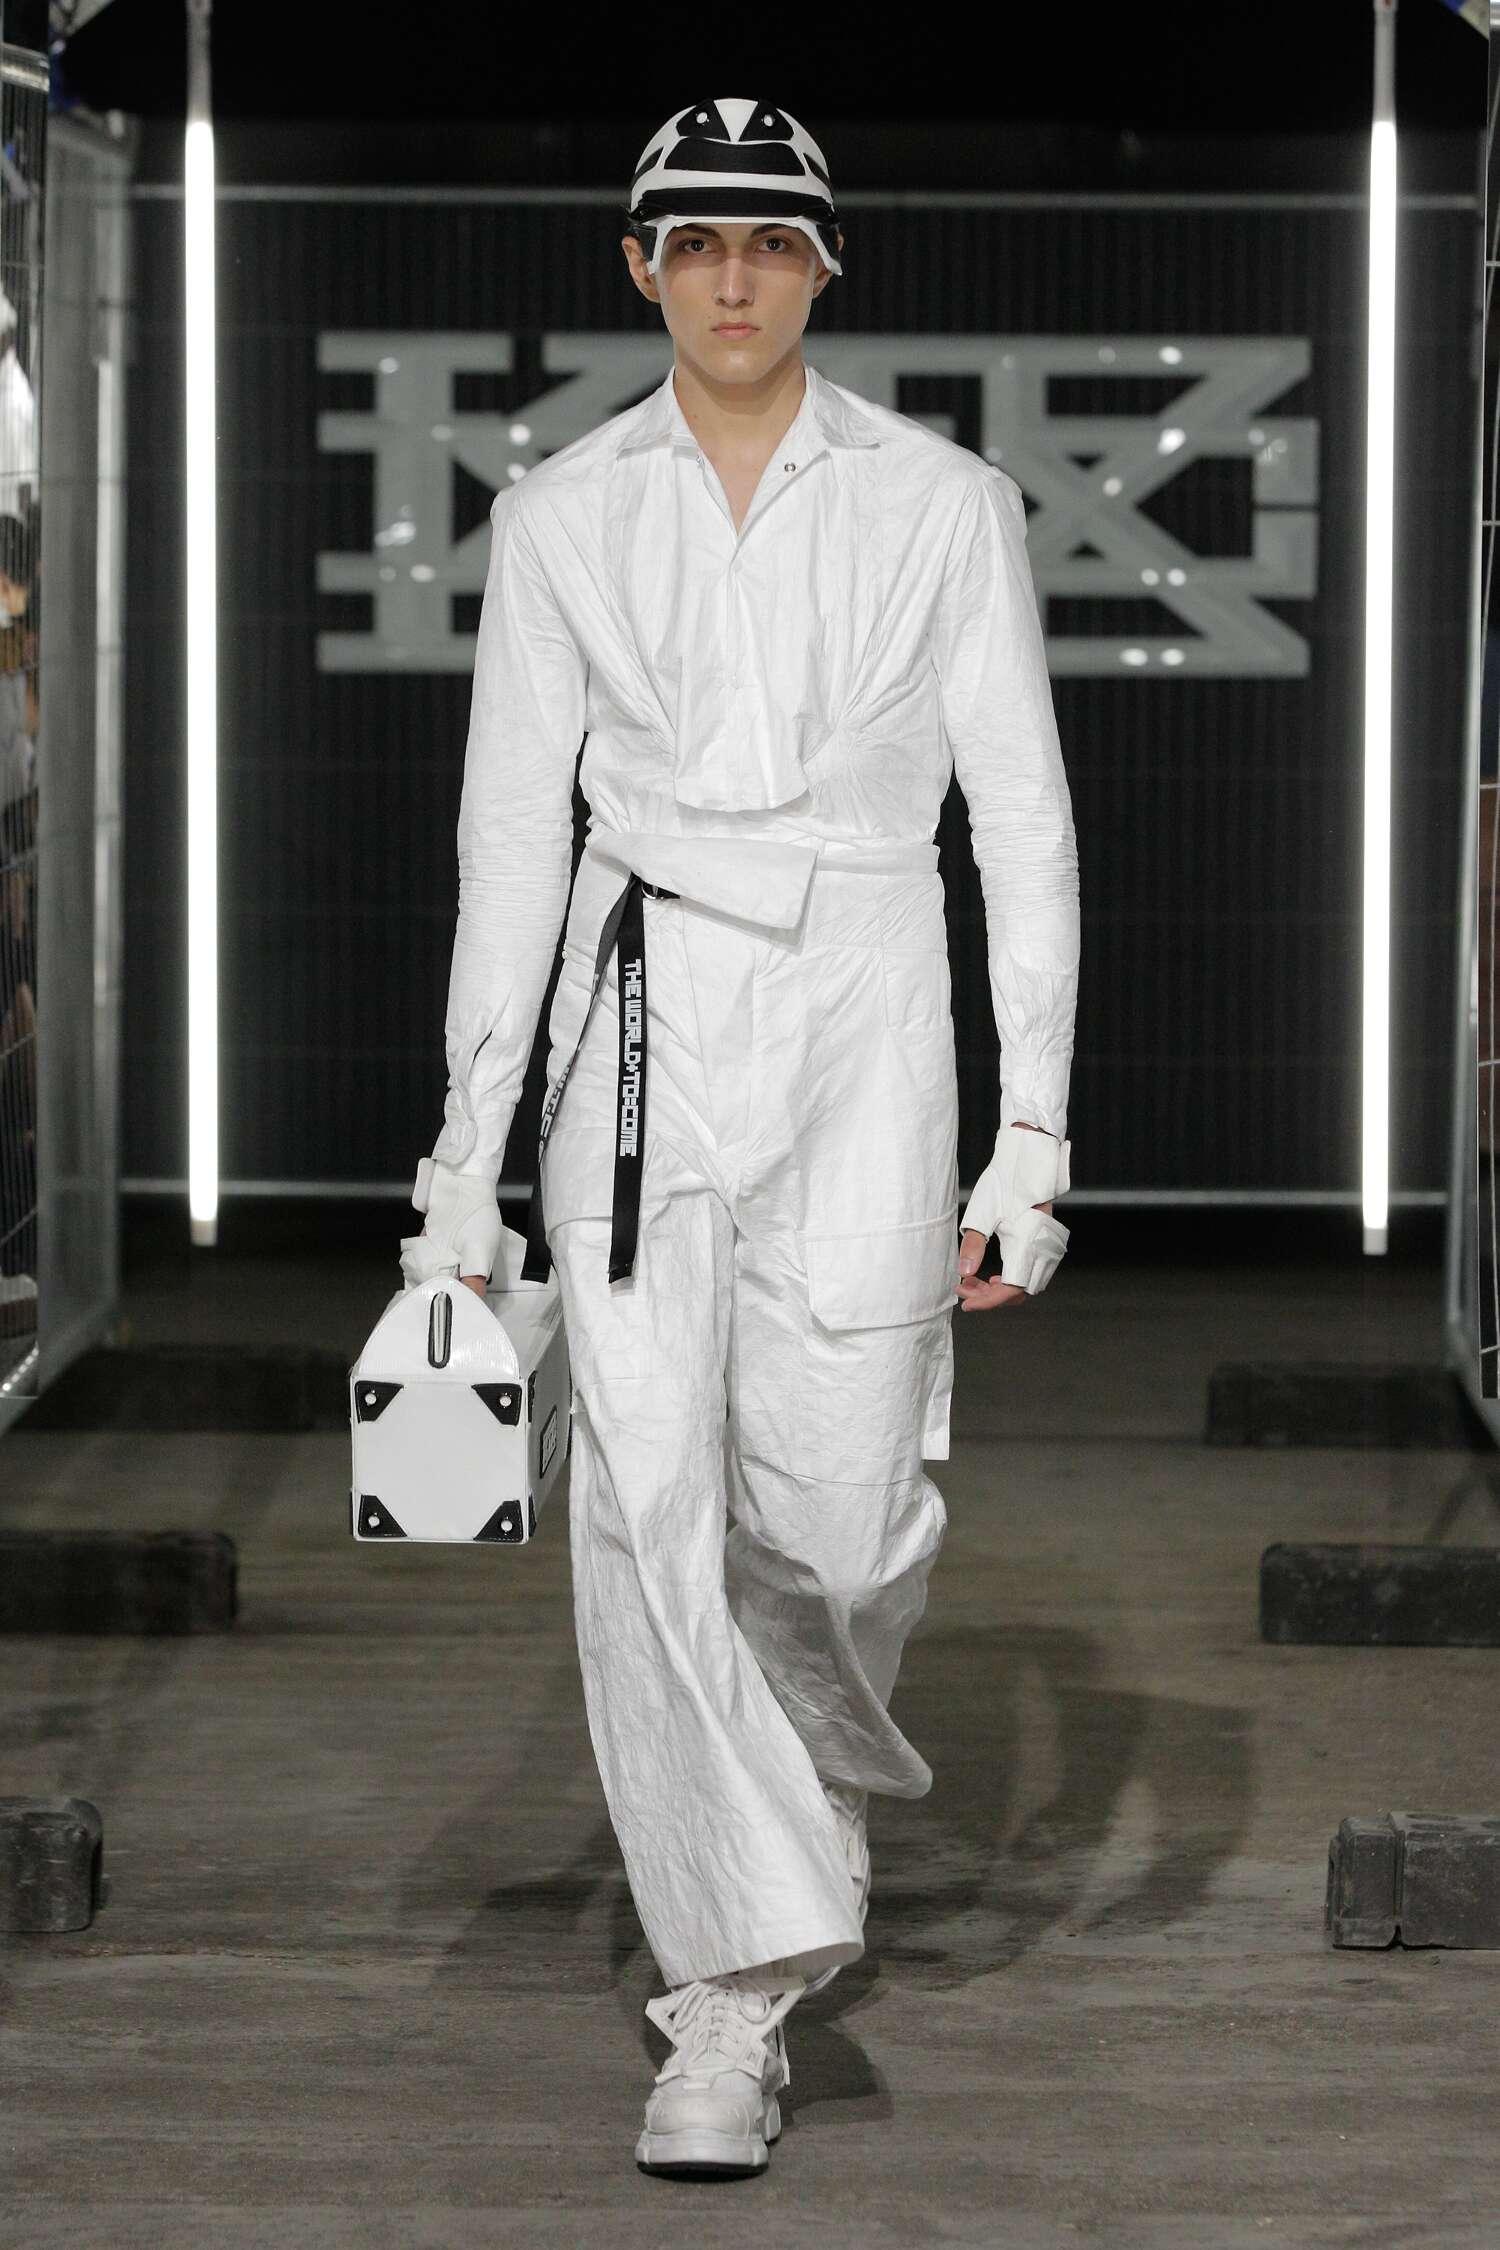 Catwalk KTZ Spring Summer 2016 Men's Collection London Fashion Week